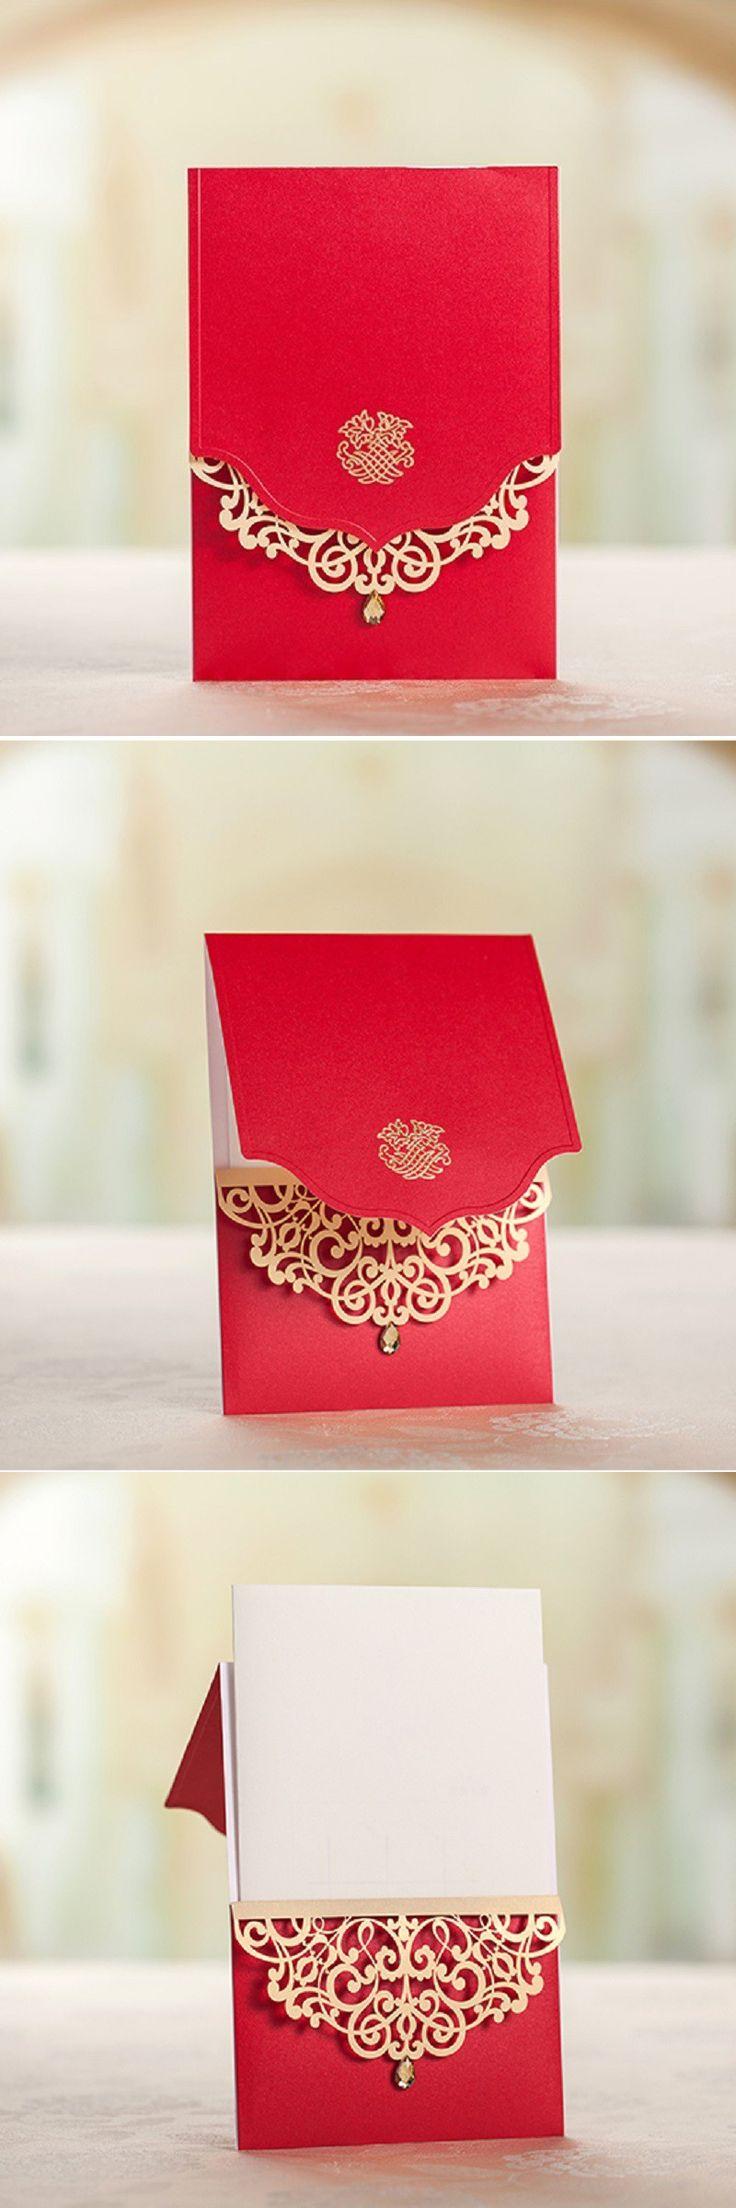 Chinese Style Luxury Wedding invitations Elegant Laser cut Invitation card,Modern Marriage party invitations $75